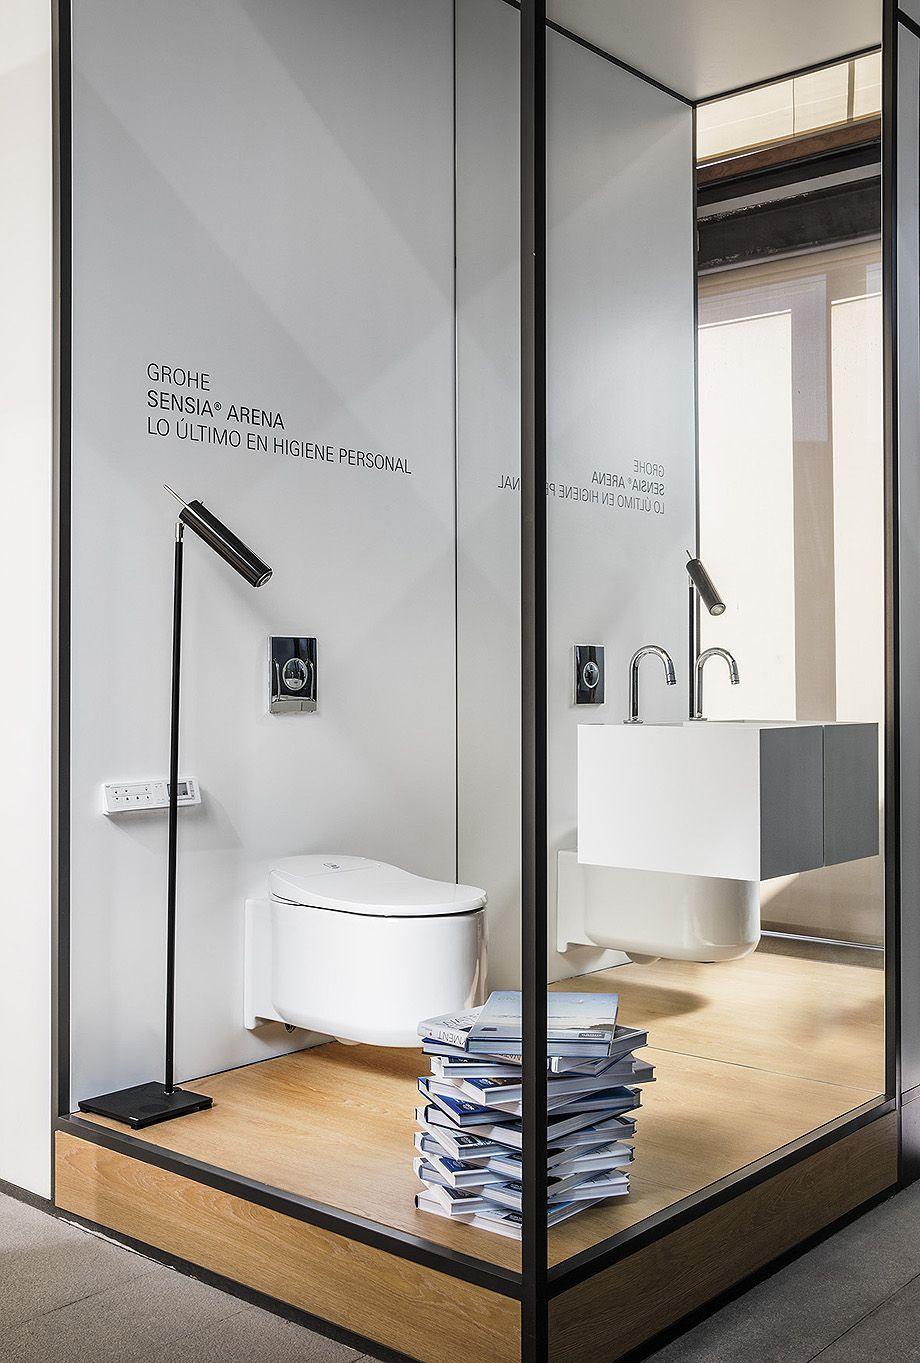 Ampliacion Showroom Grohe En El Coam 6 Bathroomshowrooms